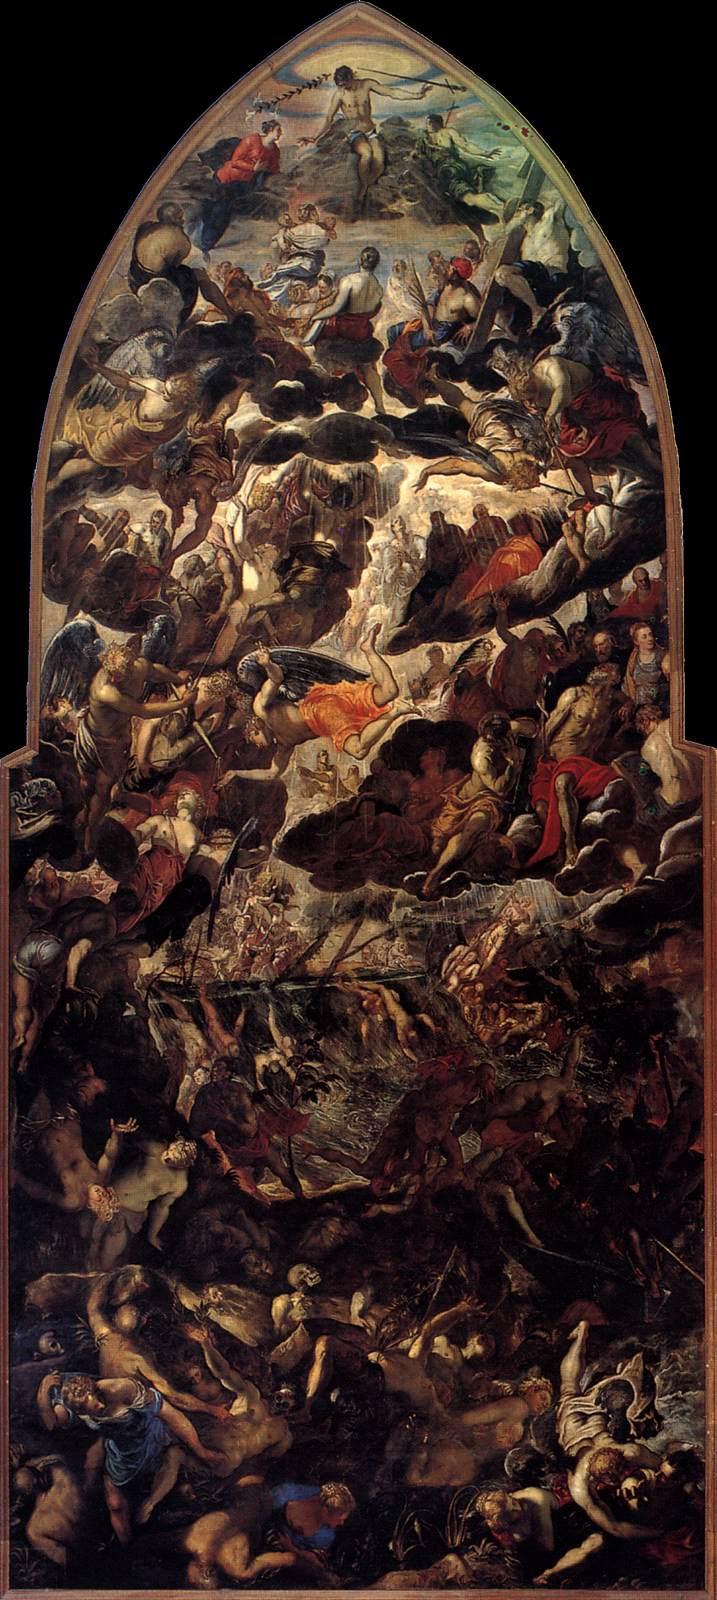 Jacopo_Tintoretto_-_The_Last_Judgment